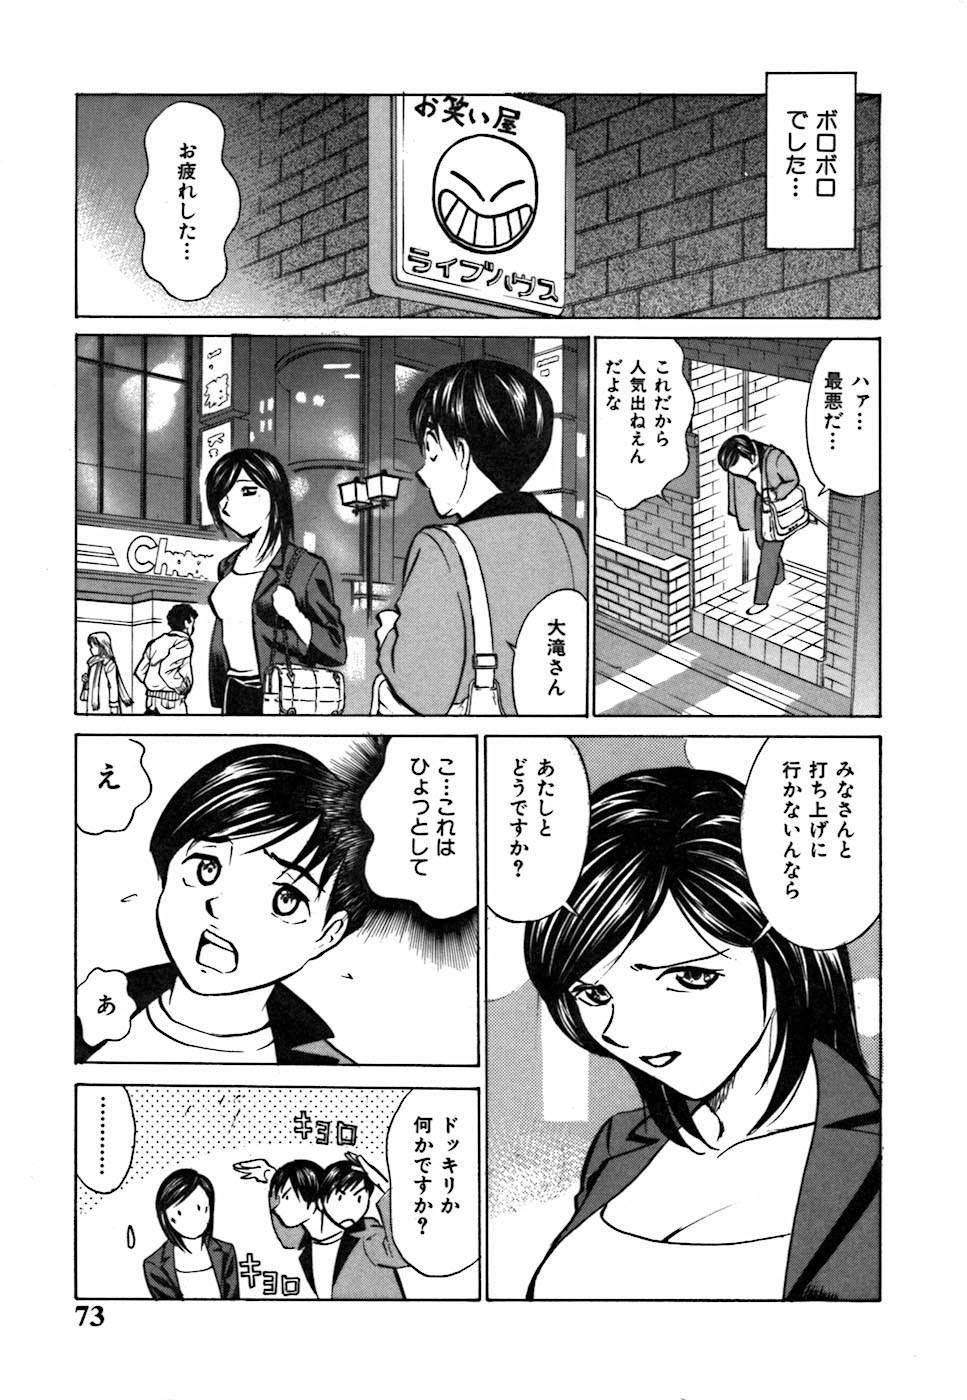 Kimi ga Nozomu Katachi | Appearance for which you hope 72